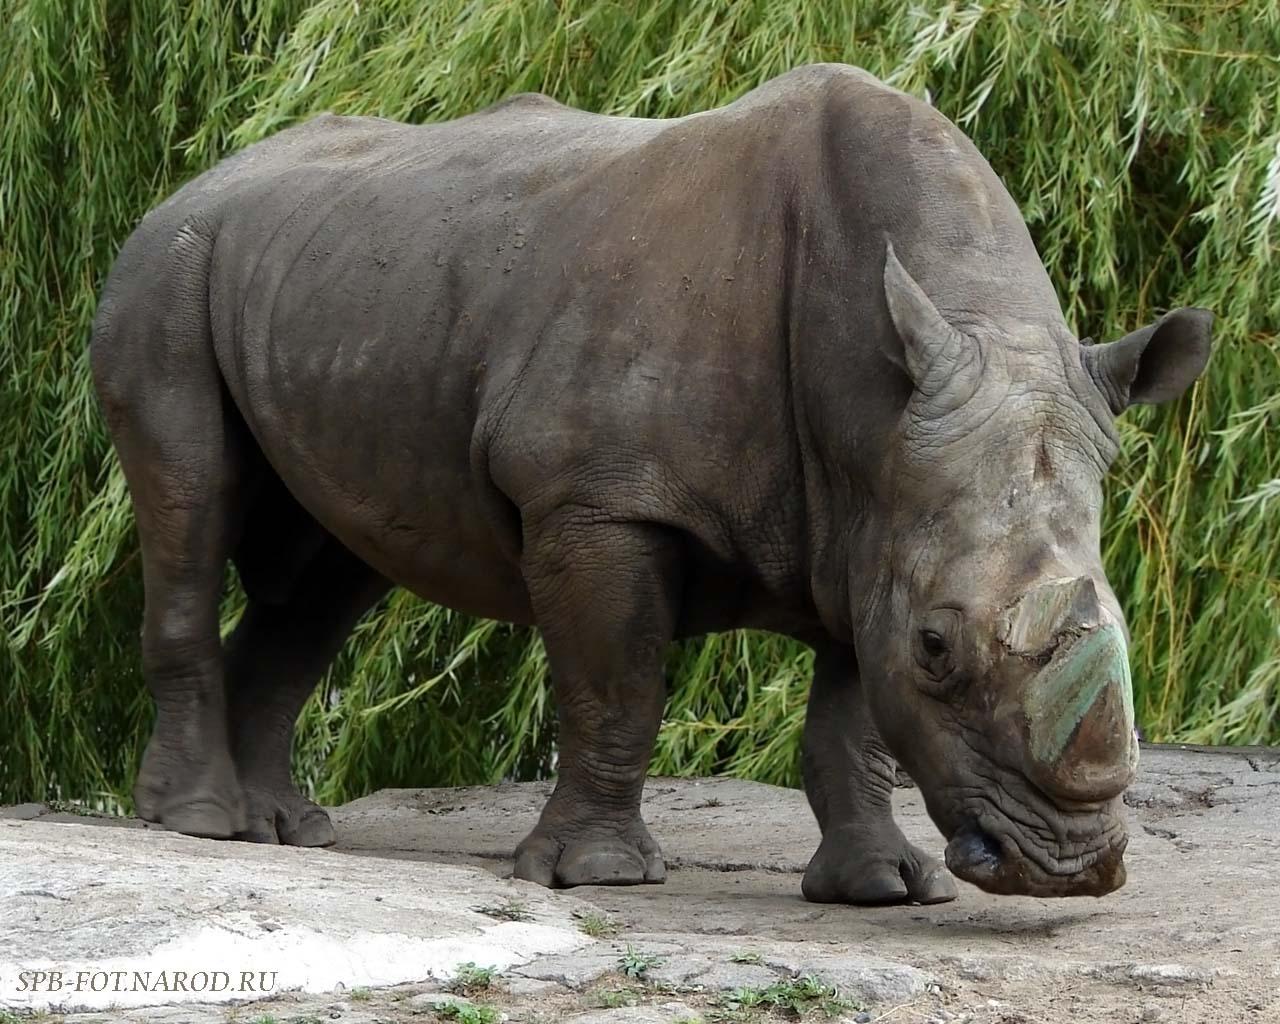 Love U Wallpapers: rhinoceros backgrounds